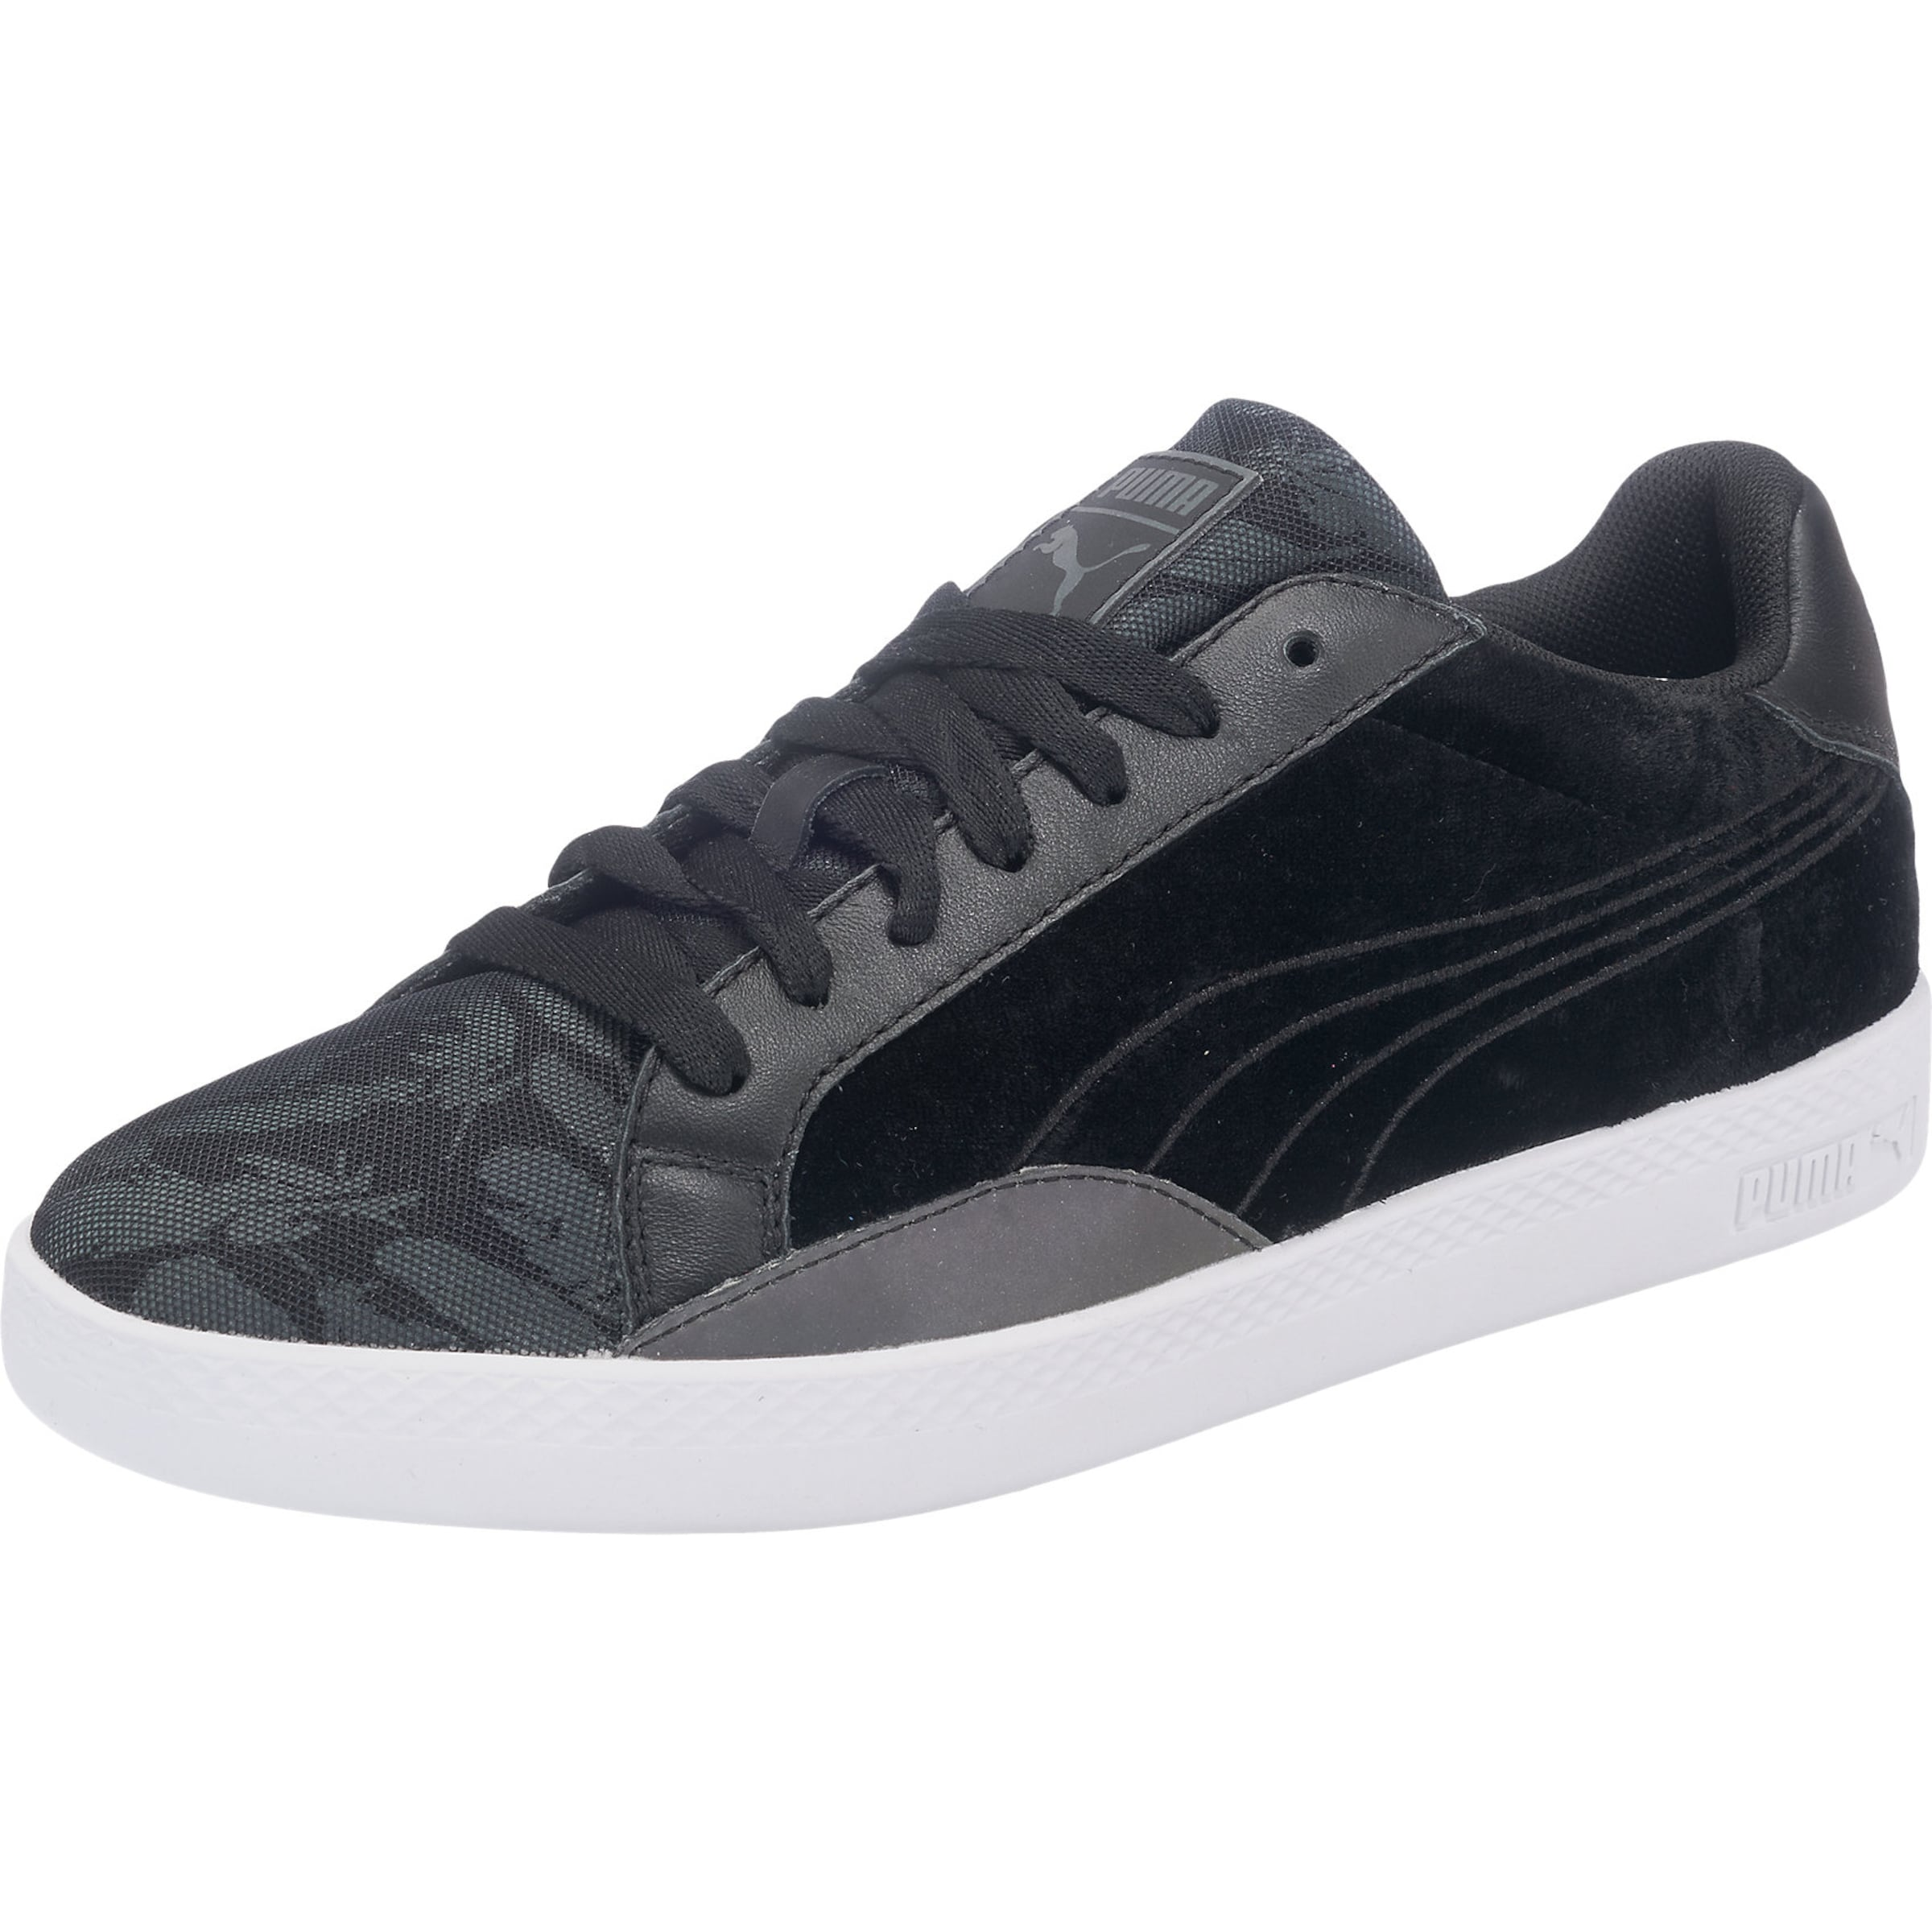 PUMA Match Swan Sneakers Verschleißfeste billige Schuhe